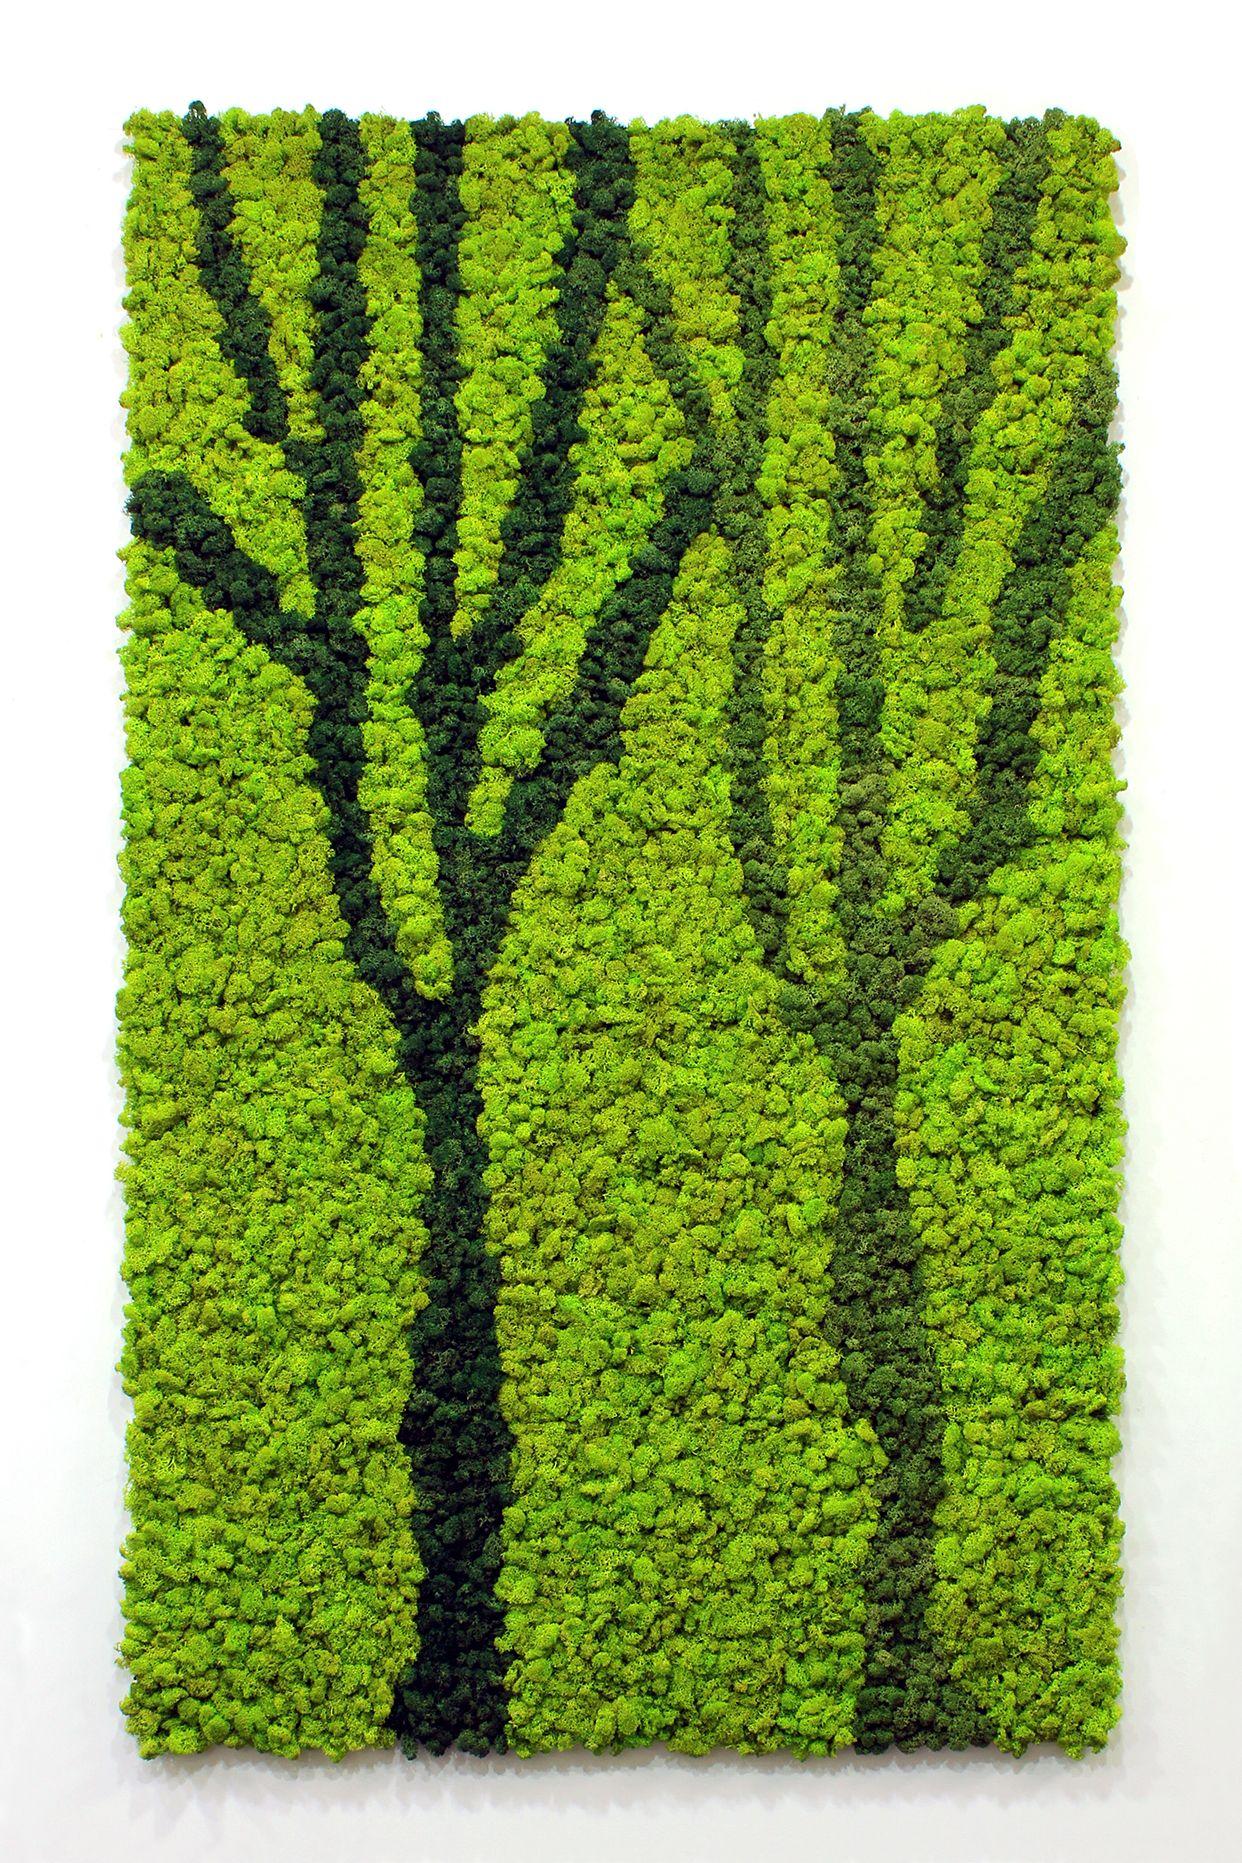 Scandia Moss Custom Art - Each art piece was created by combining ...